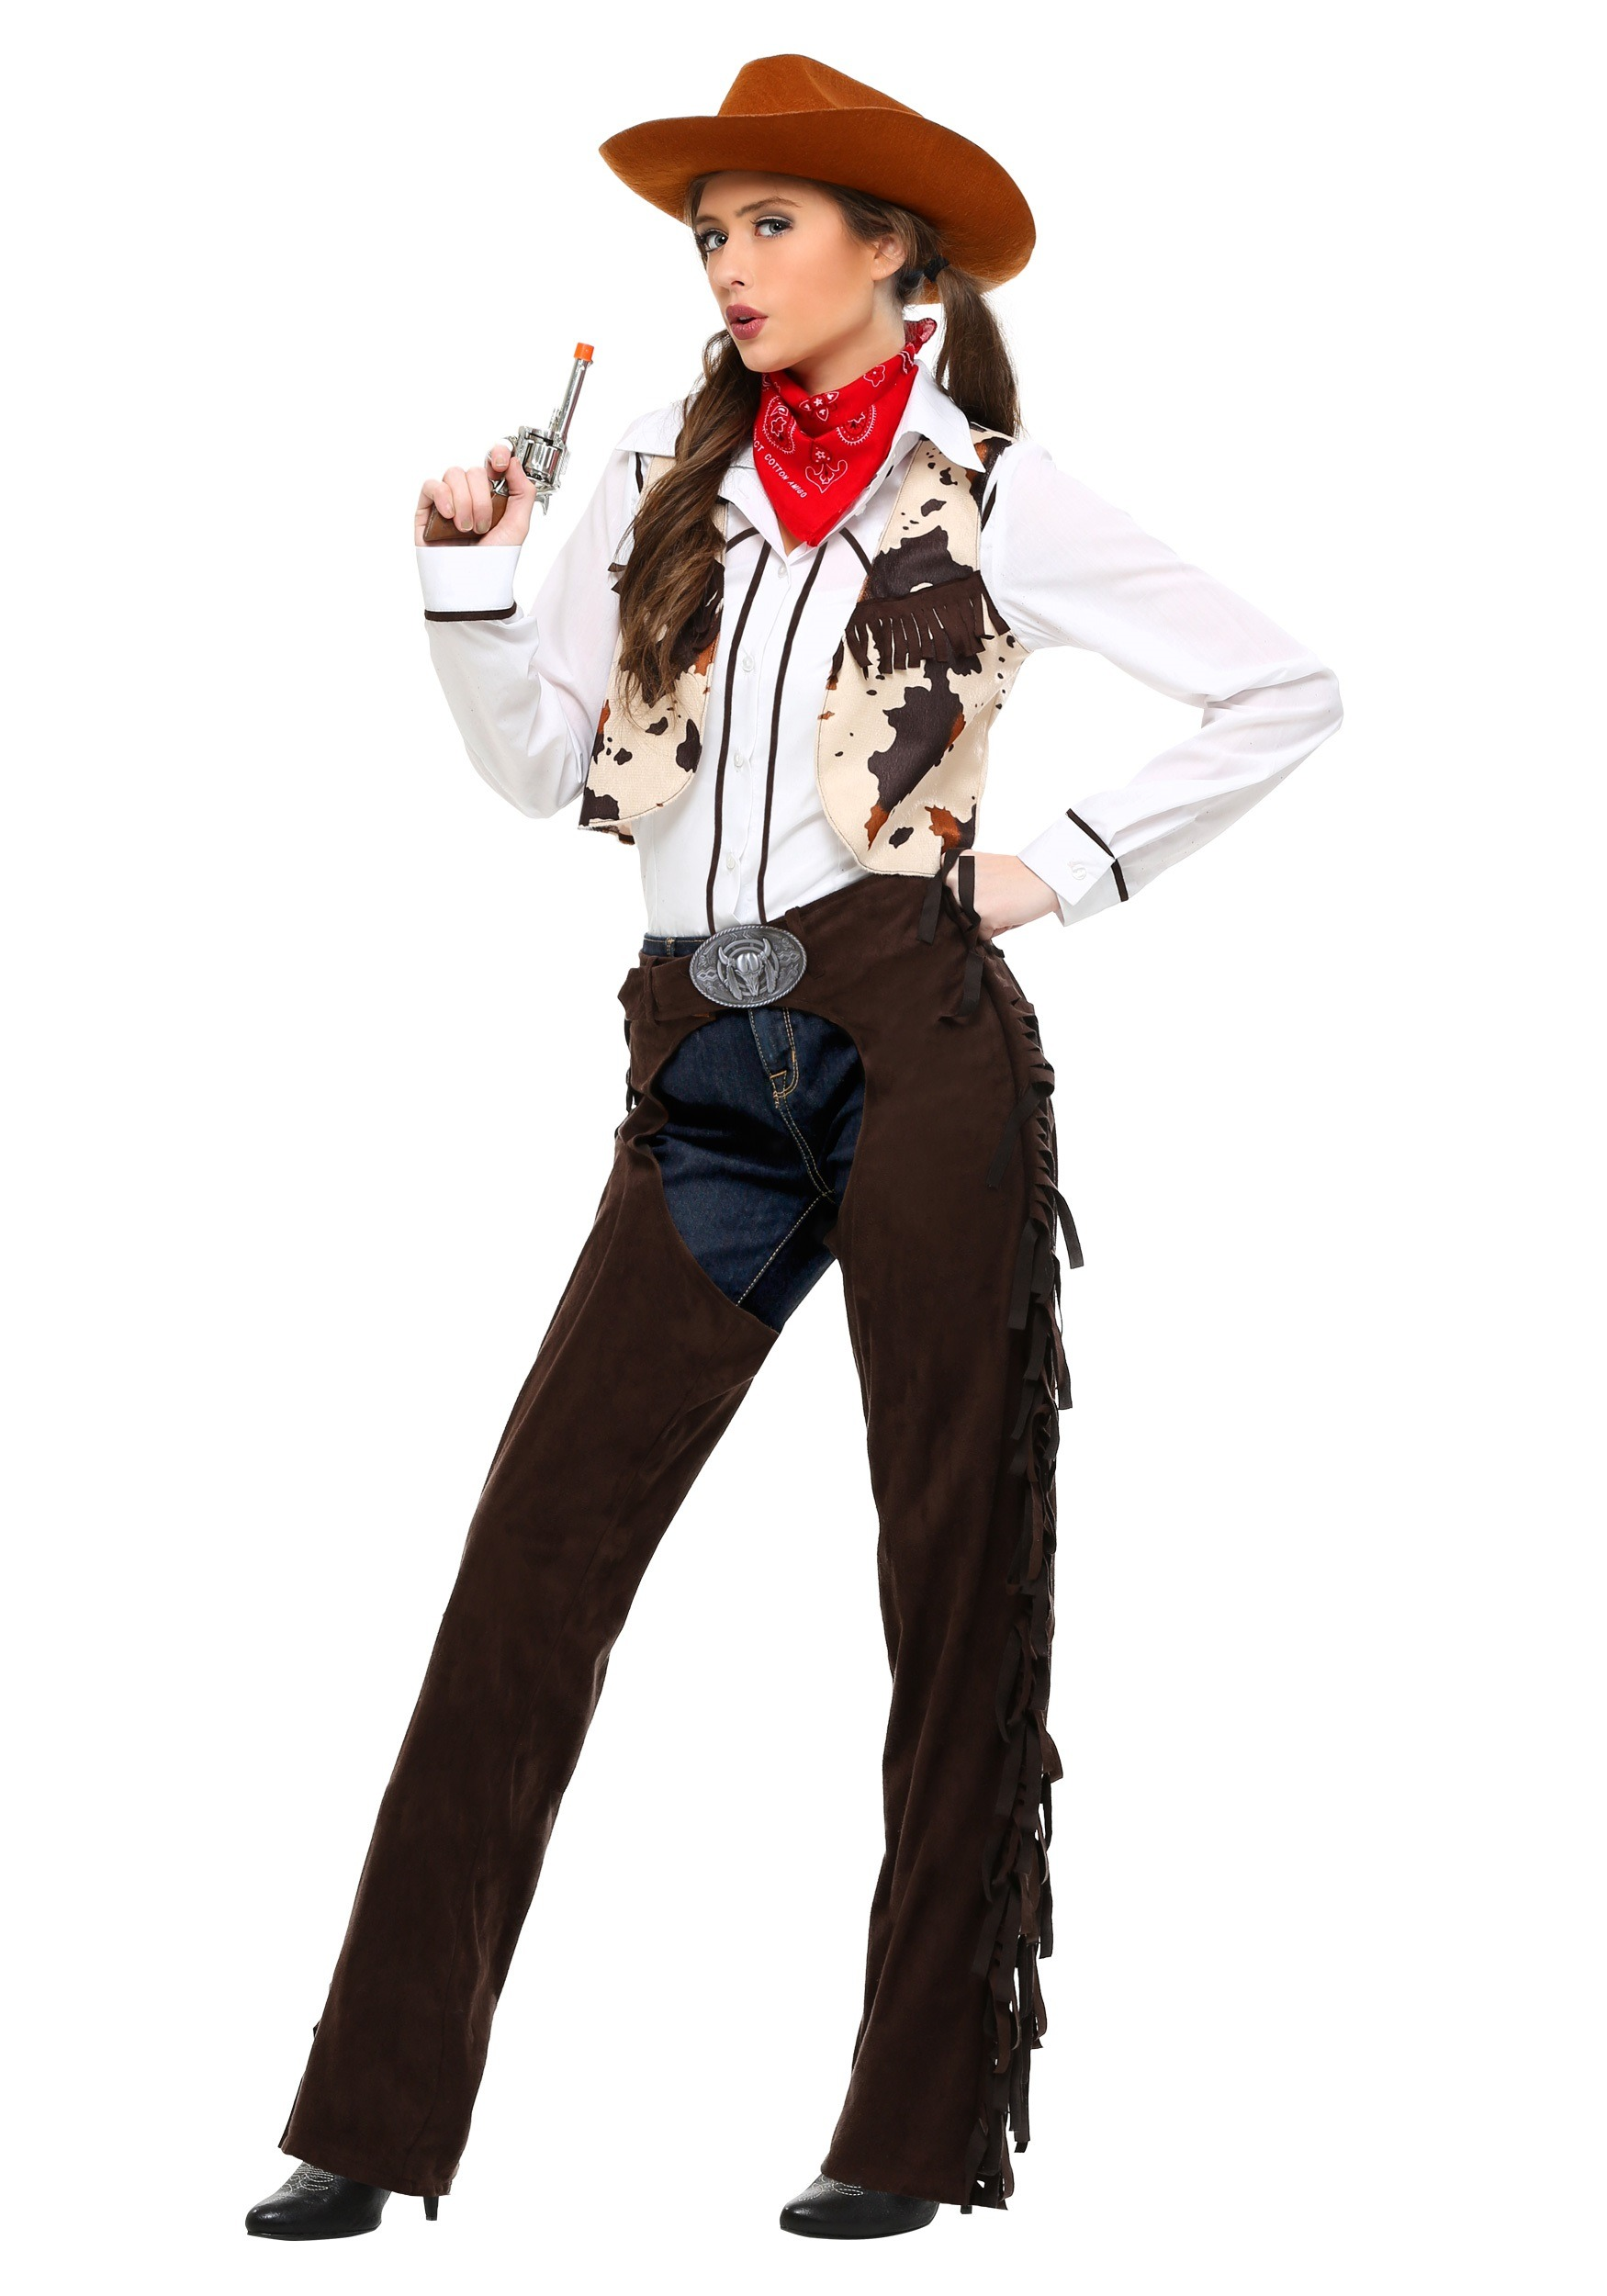 Cowboy Costumes